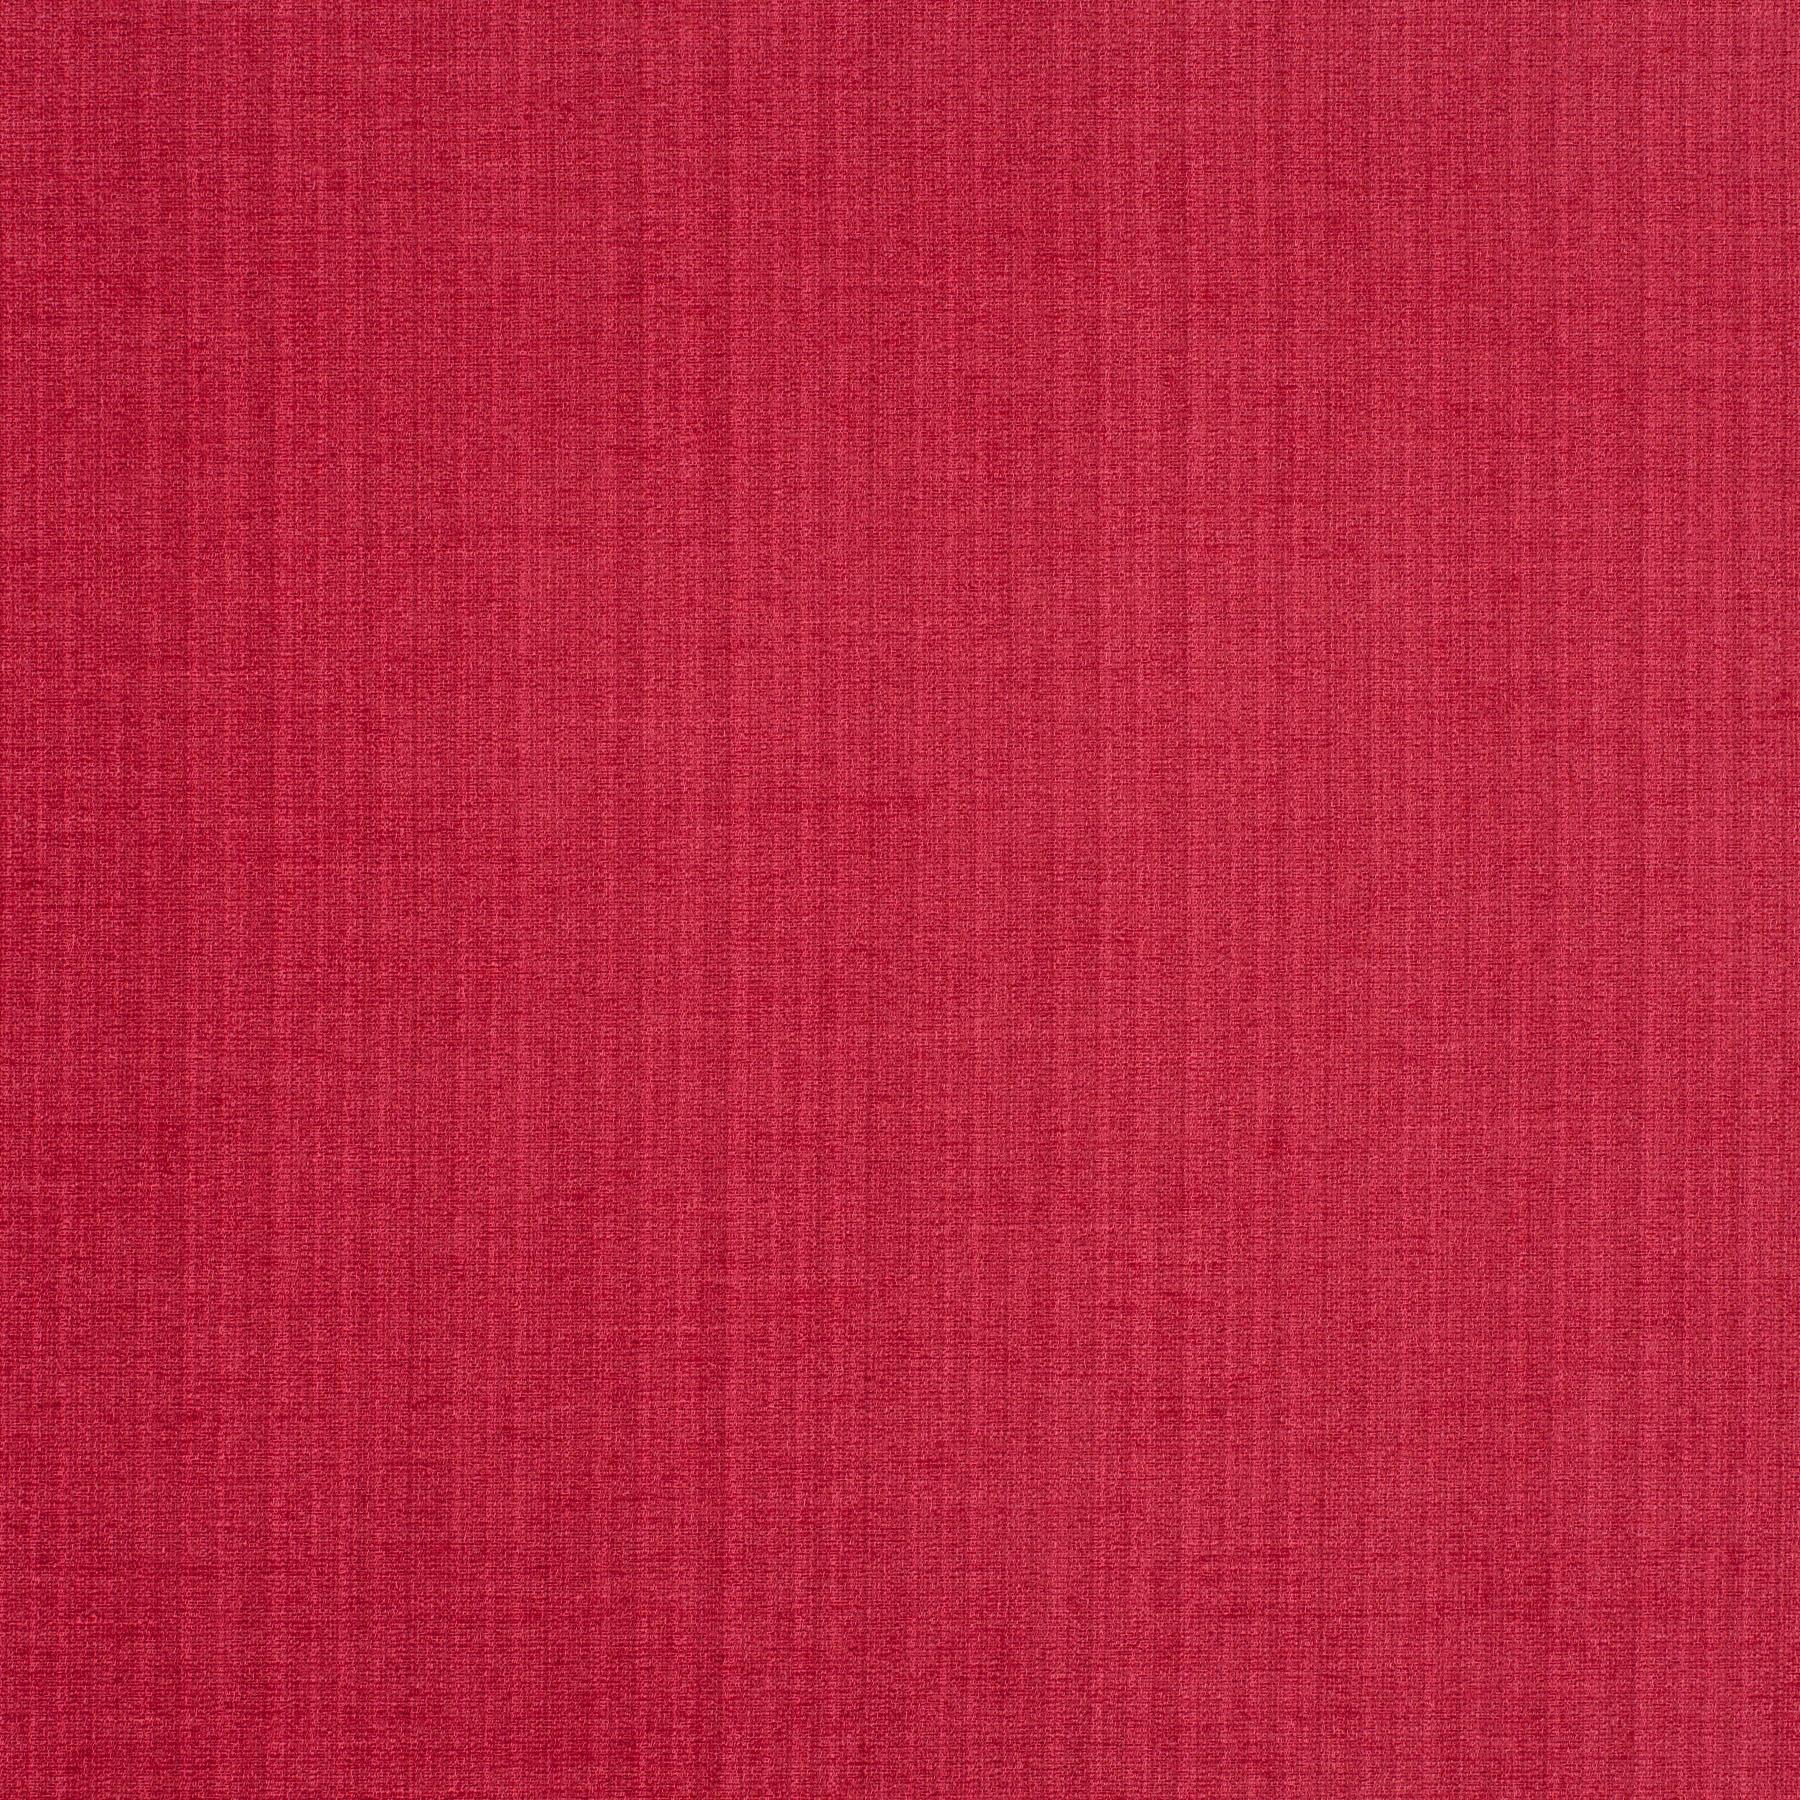 Decoration Fabric Gregory Vol 2 1 6485 060 Jab Anstoetz